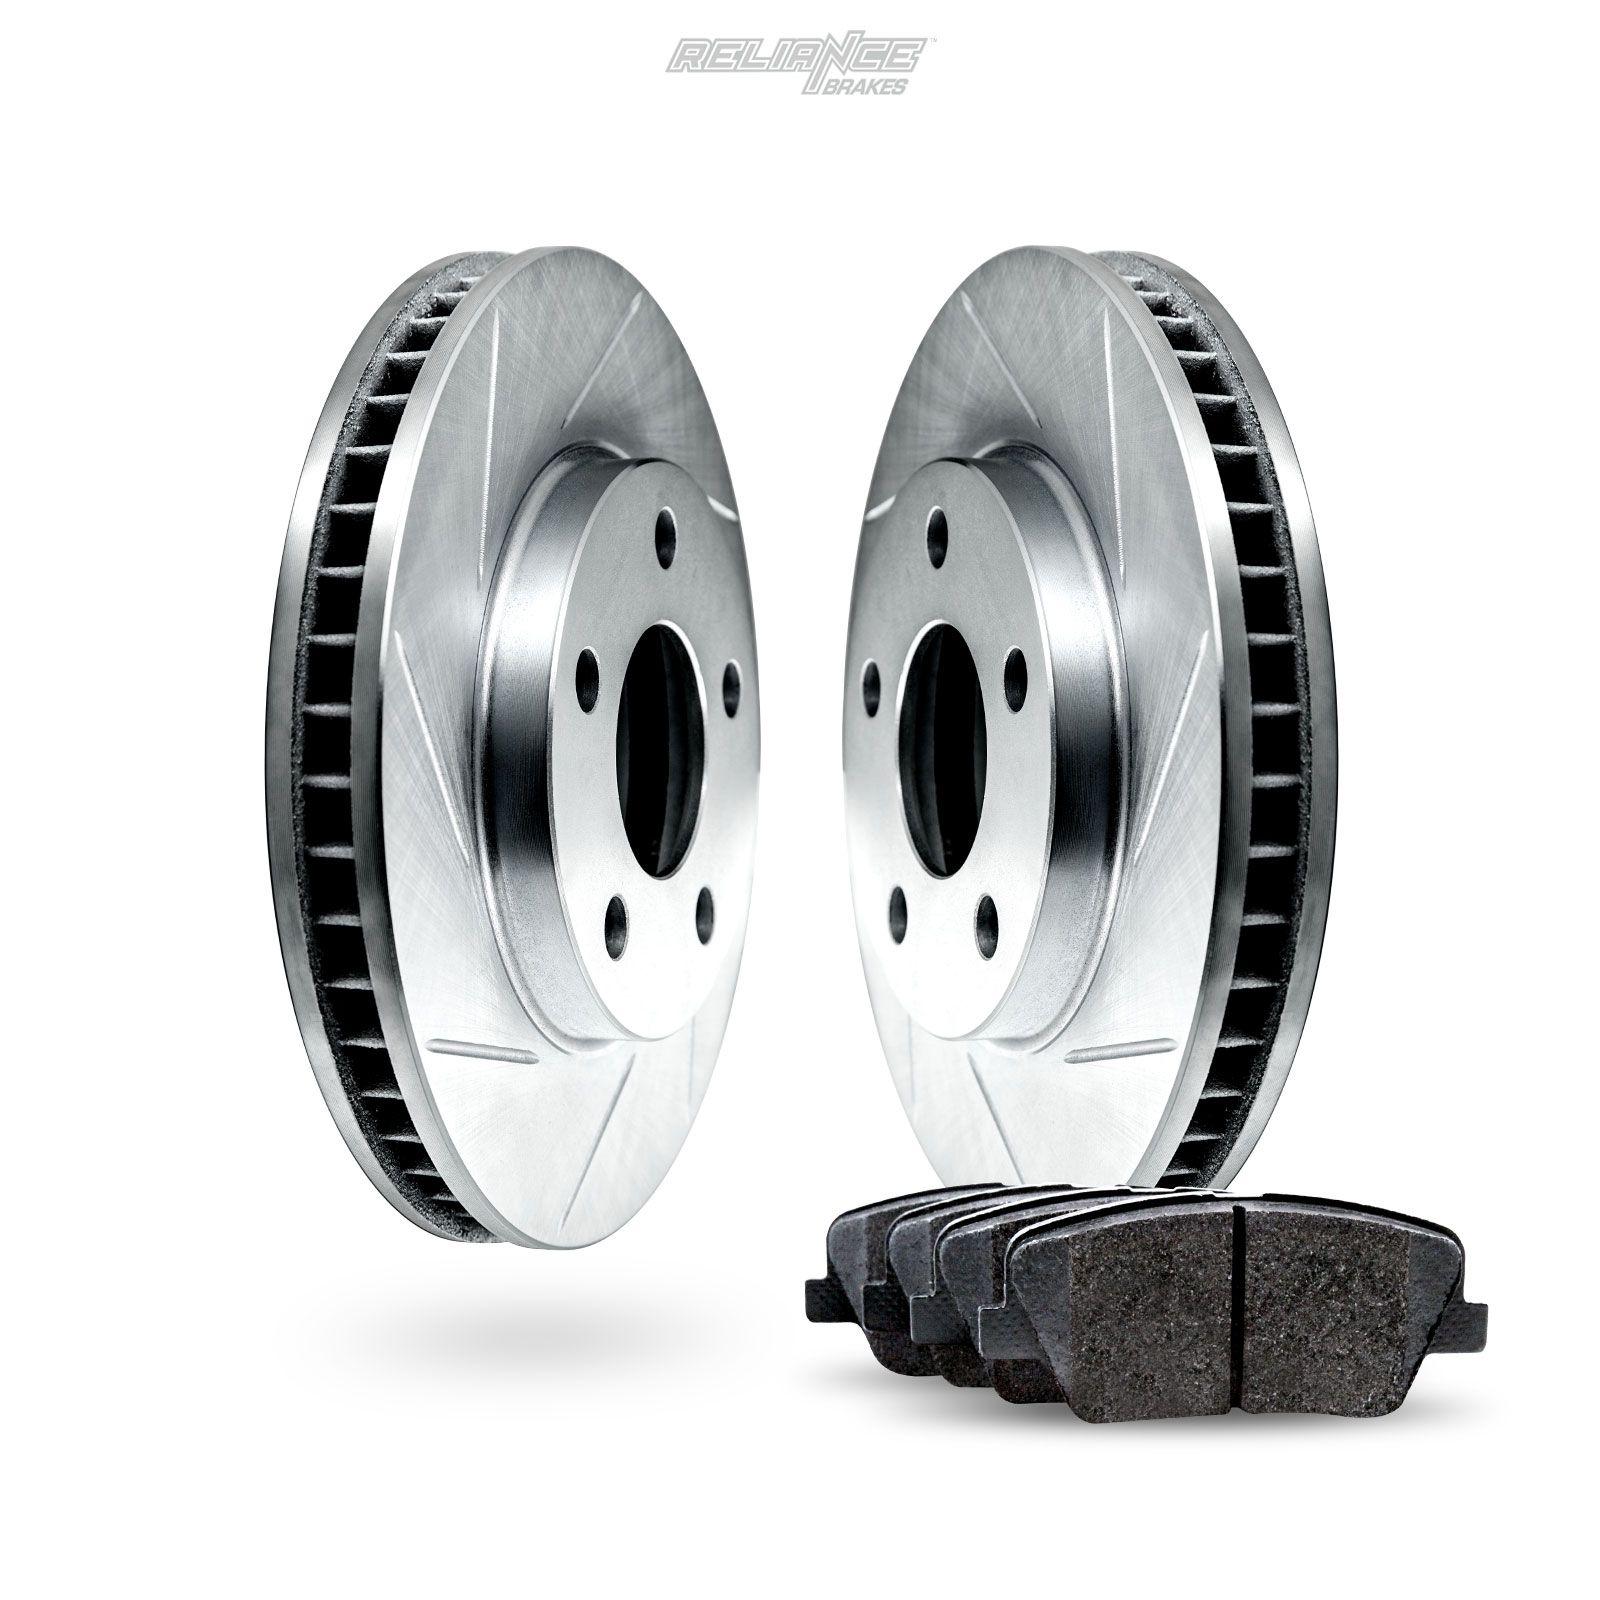 Ceramic Pads C1975 Black Hart *DRILLED /& SLOTTED* Brake Rotors FRONT+REAR KIT